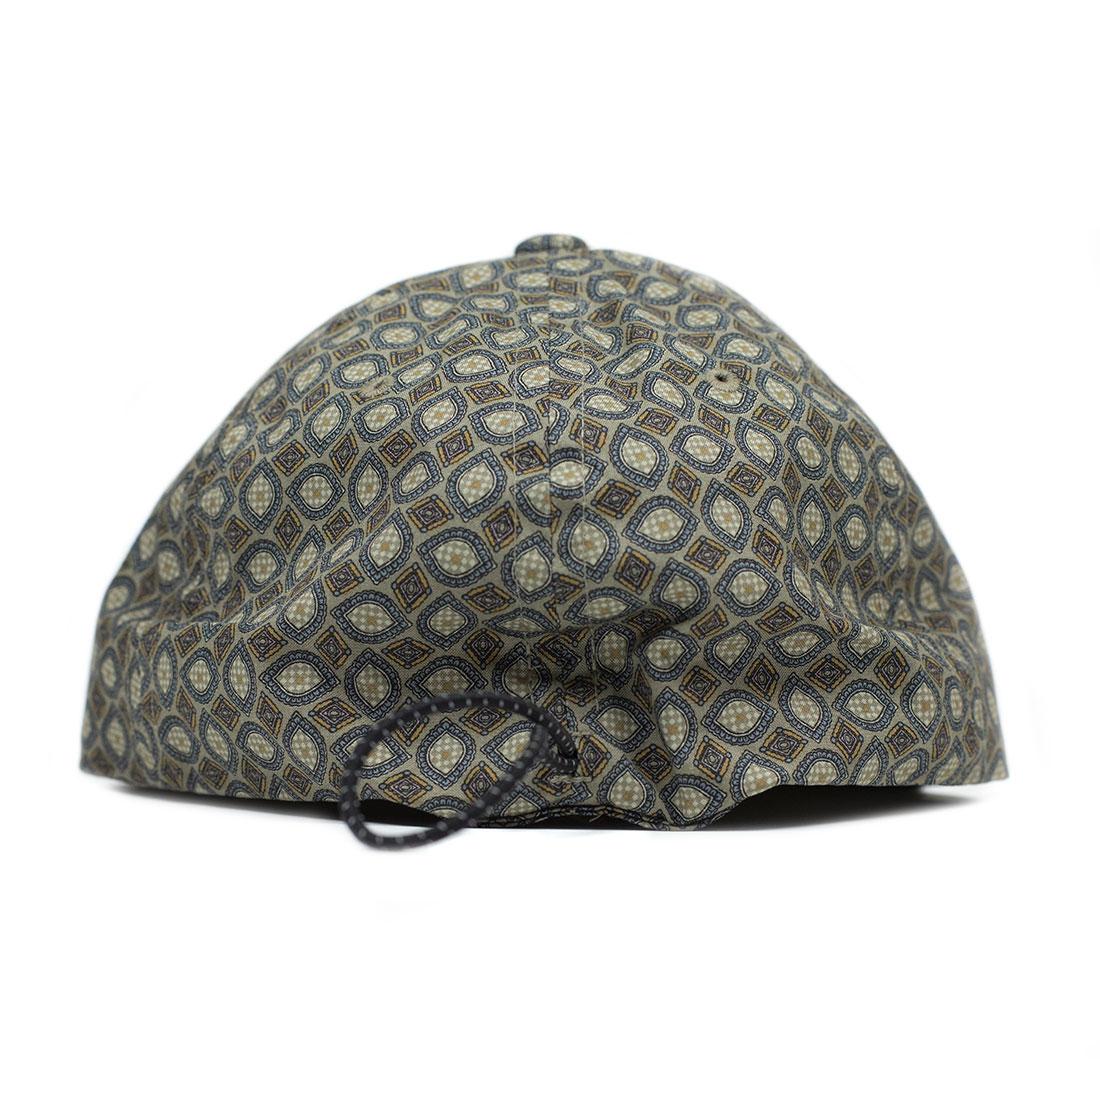 Sublime Hats Spring Summer 2021 SS21 Made in Japan carry loop printed cap (5).jpg